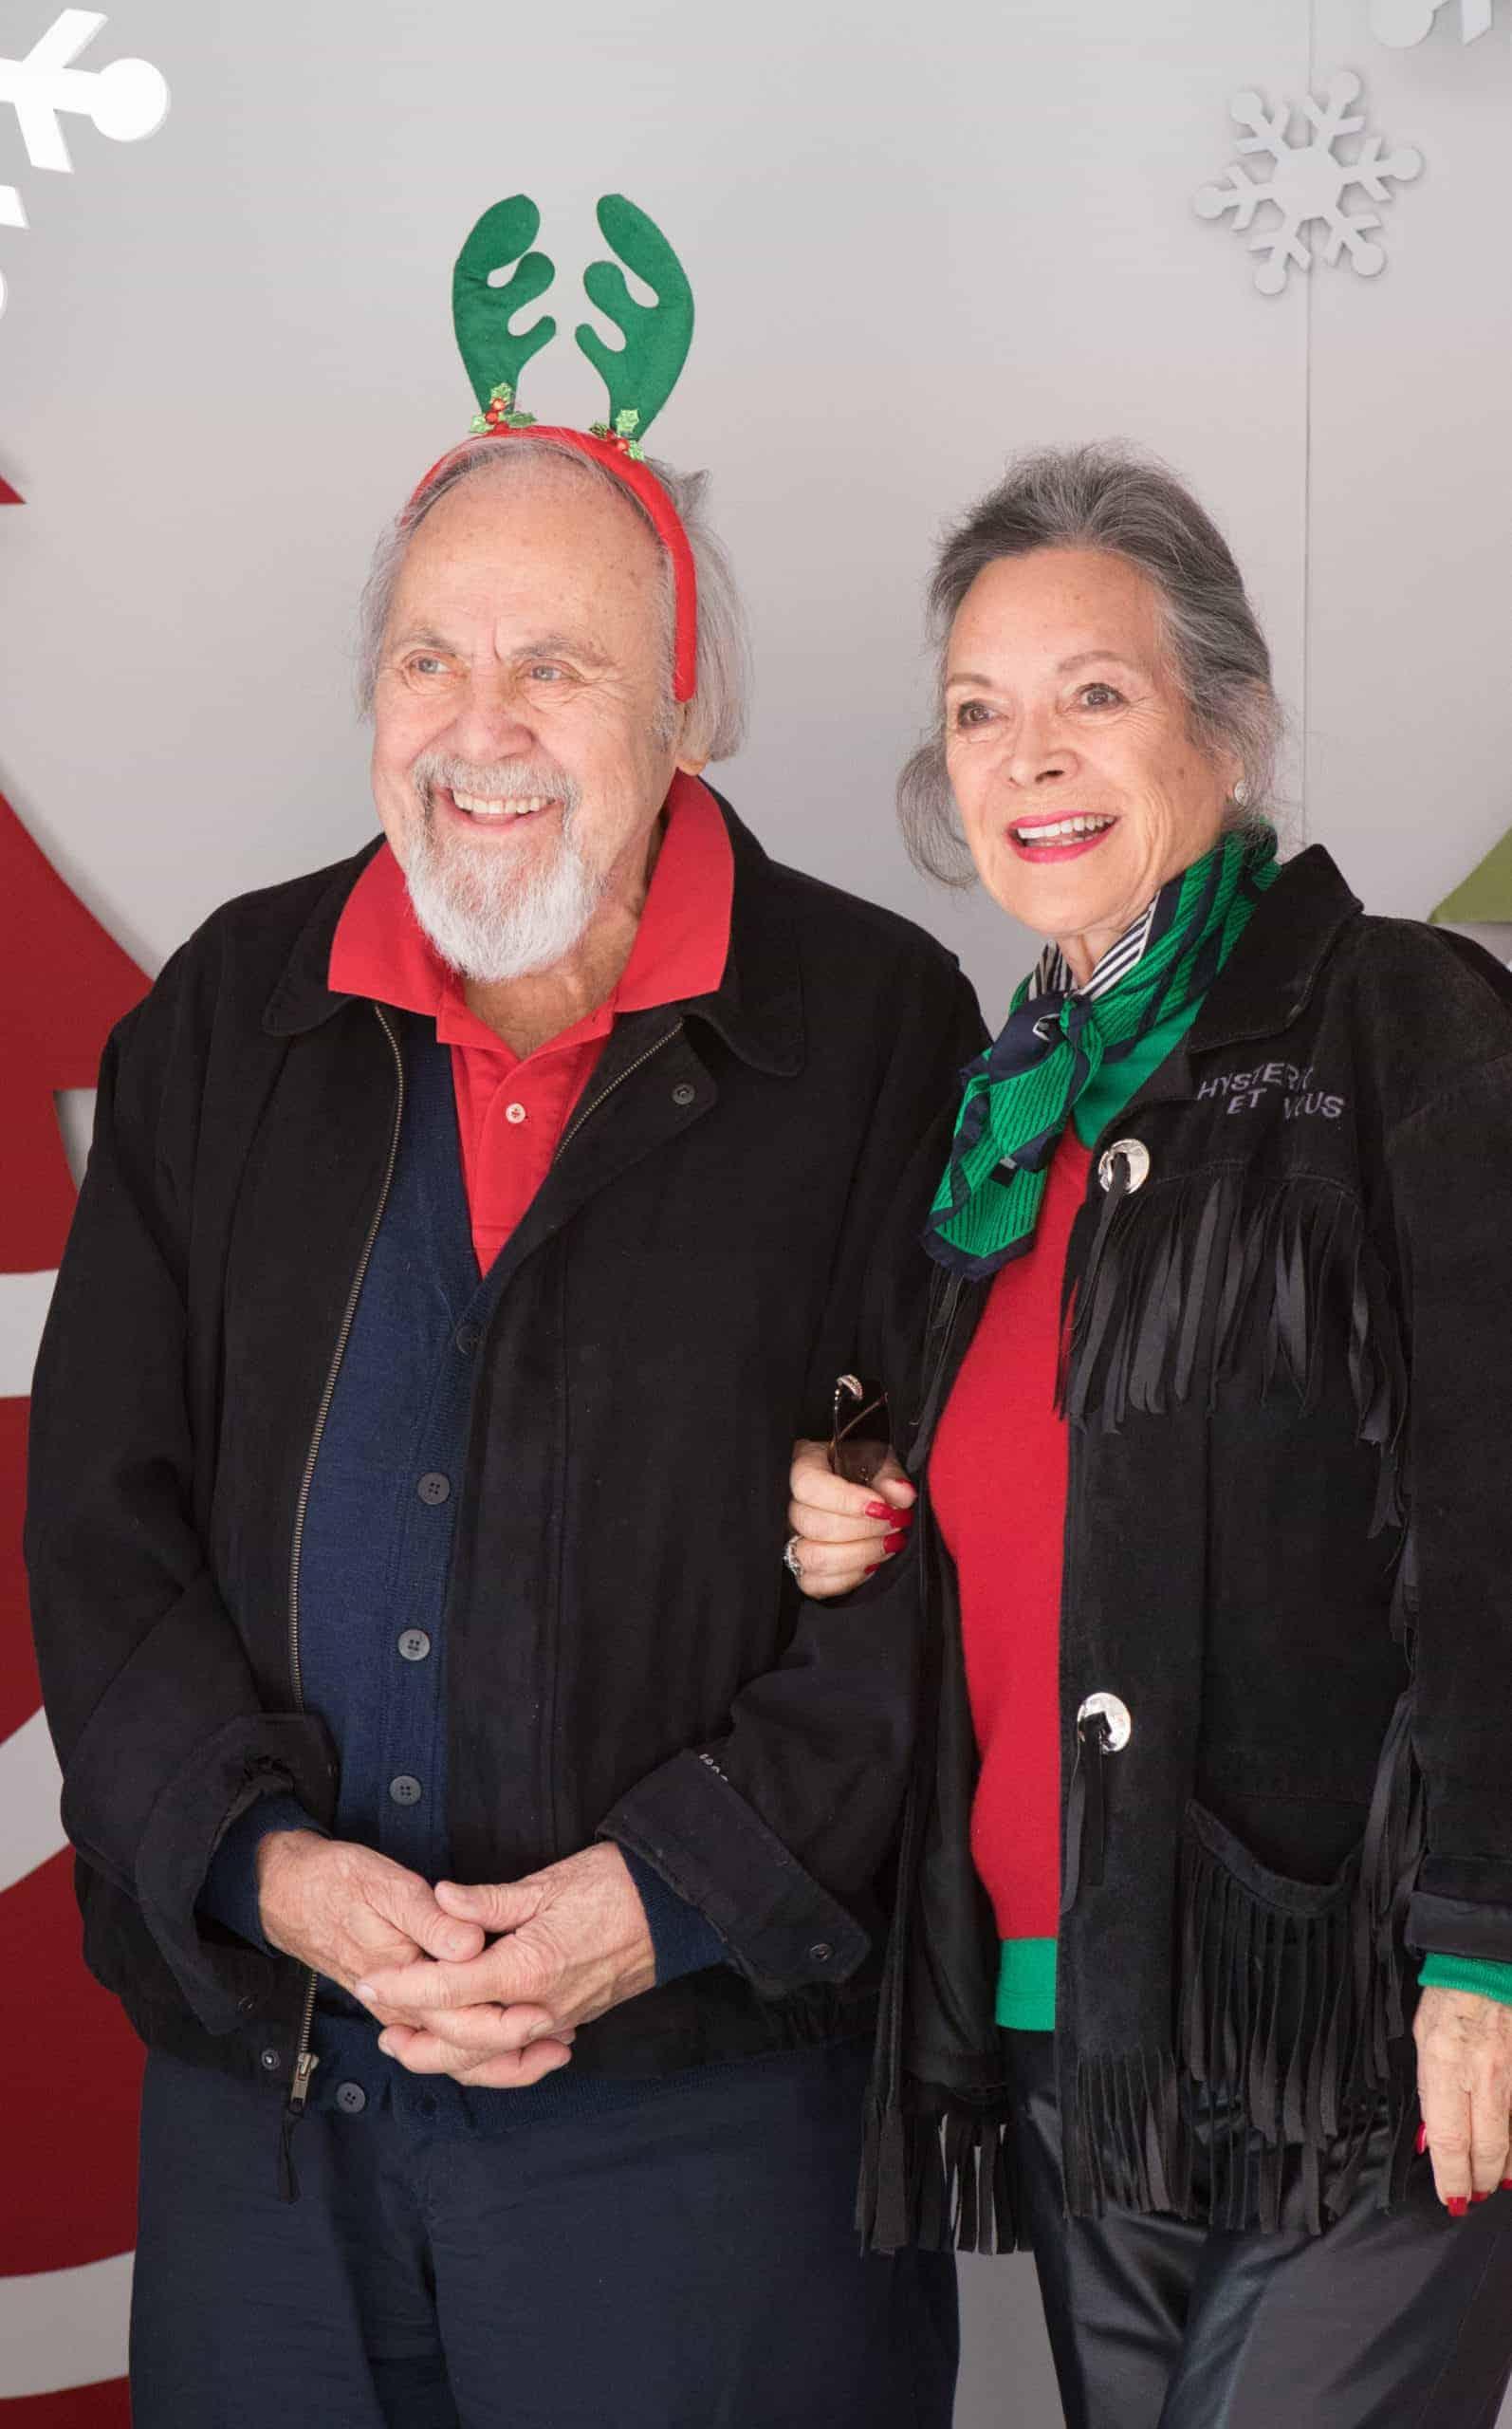 George Schlatter and Jolene Brand